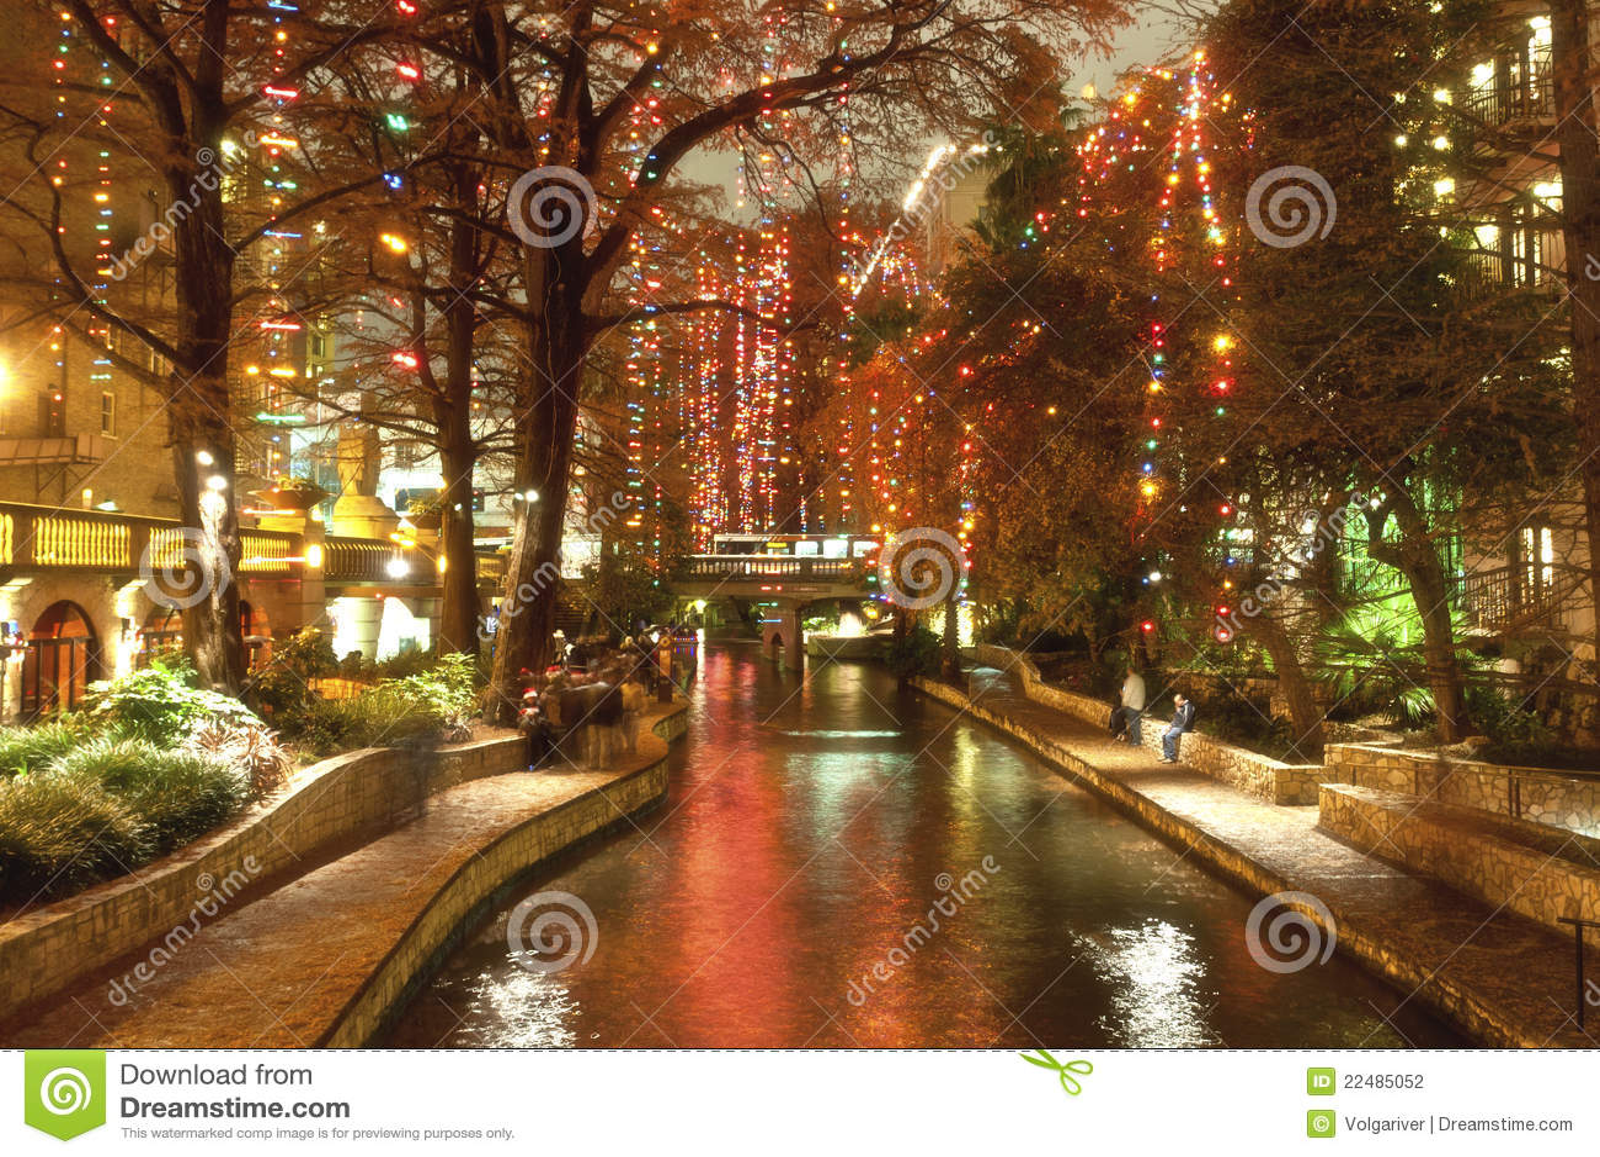 Riverwalk San Antonio Christmas.Riverwalk In San Antonio At Night At Holidays Stock Photo